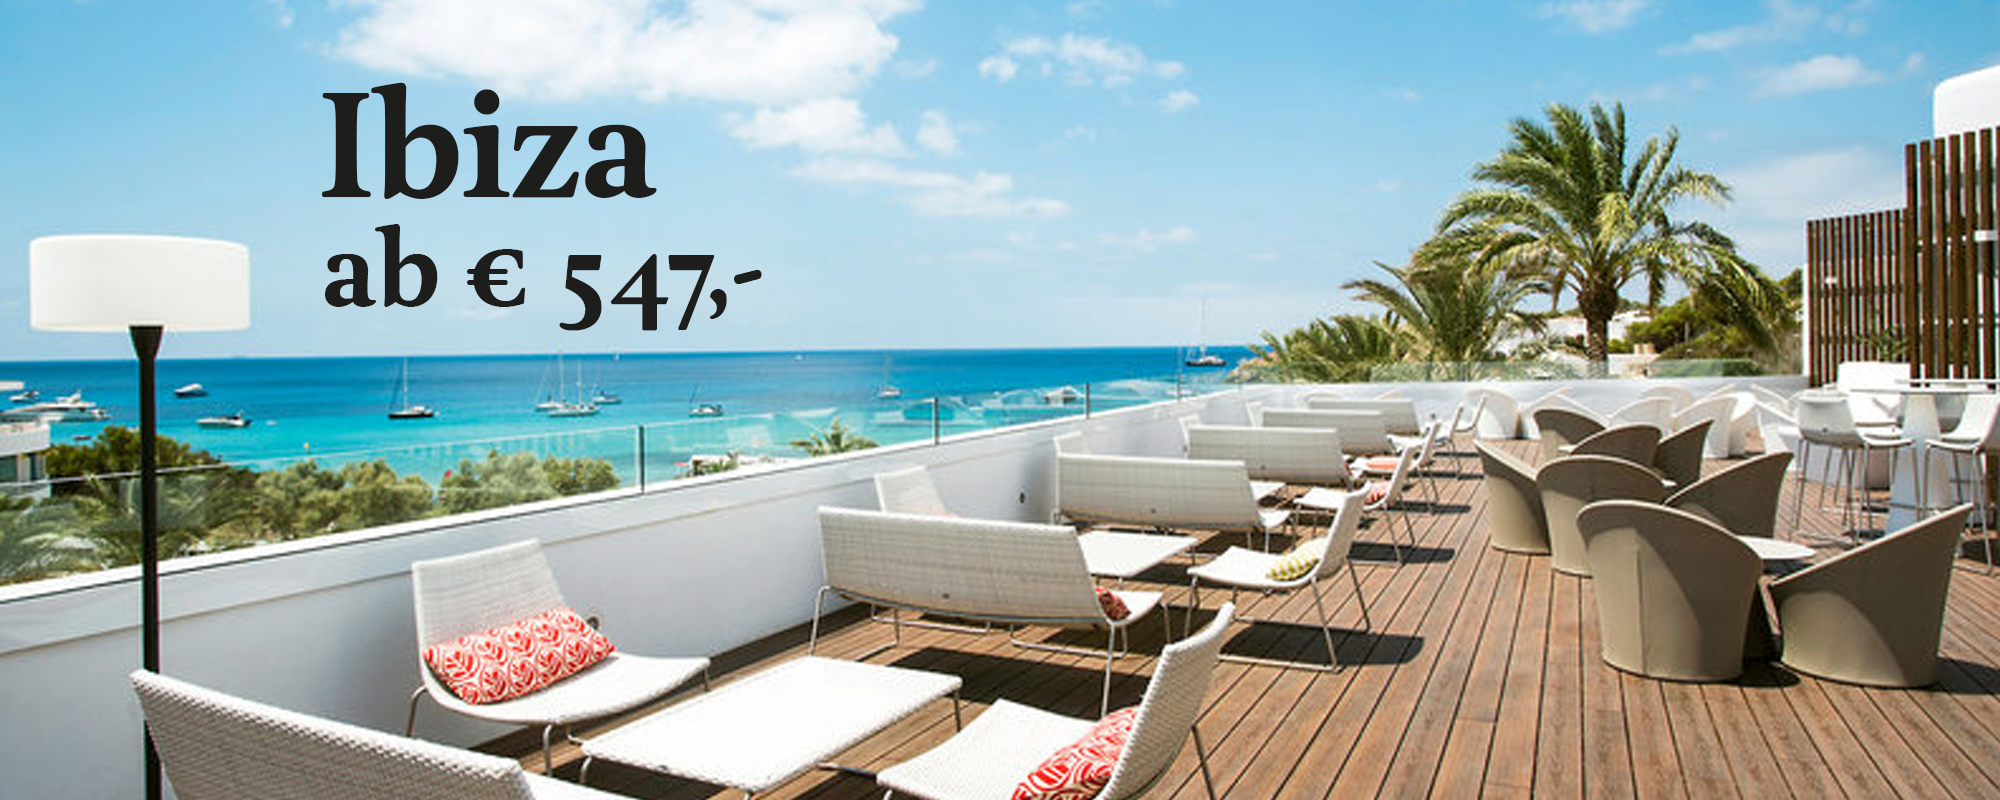 Ibiza Angebote